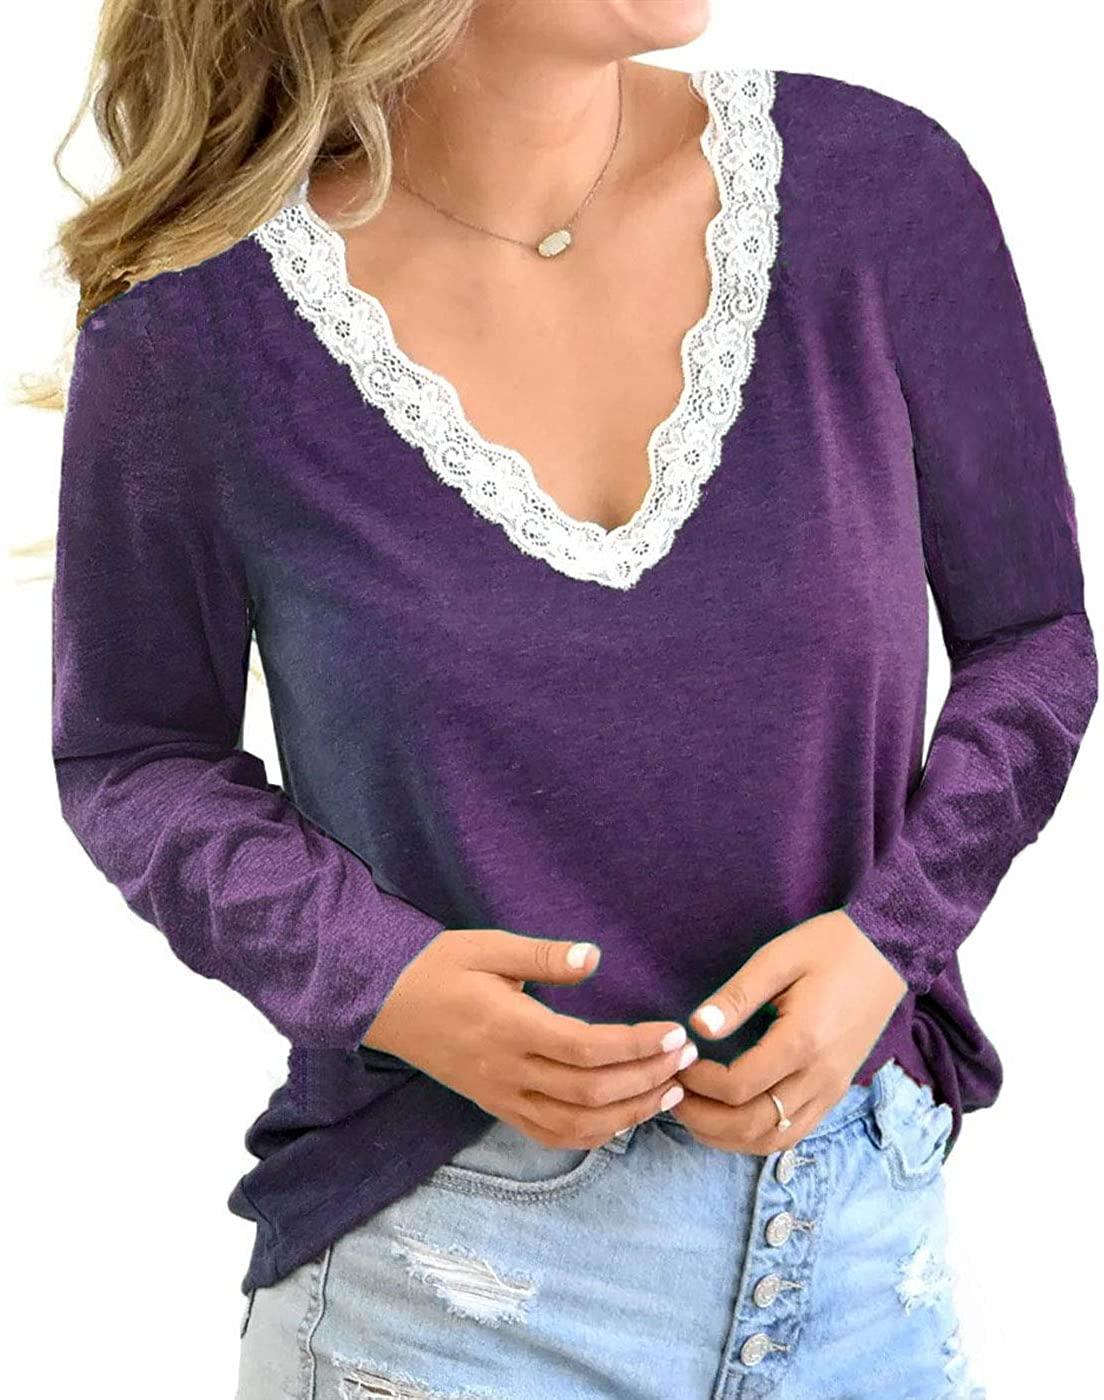 Kinlonsair Women Crochet Lace Basic V-Neck T-Shirt Short Sleeve Loose Fitting Tunic